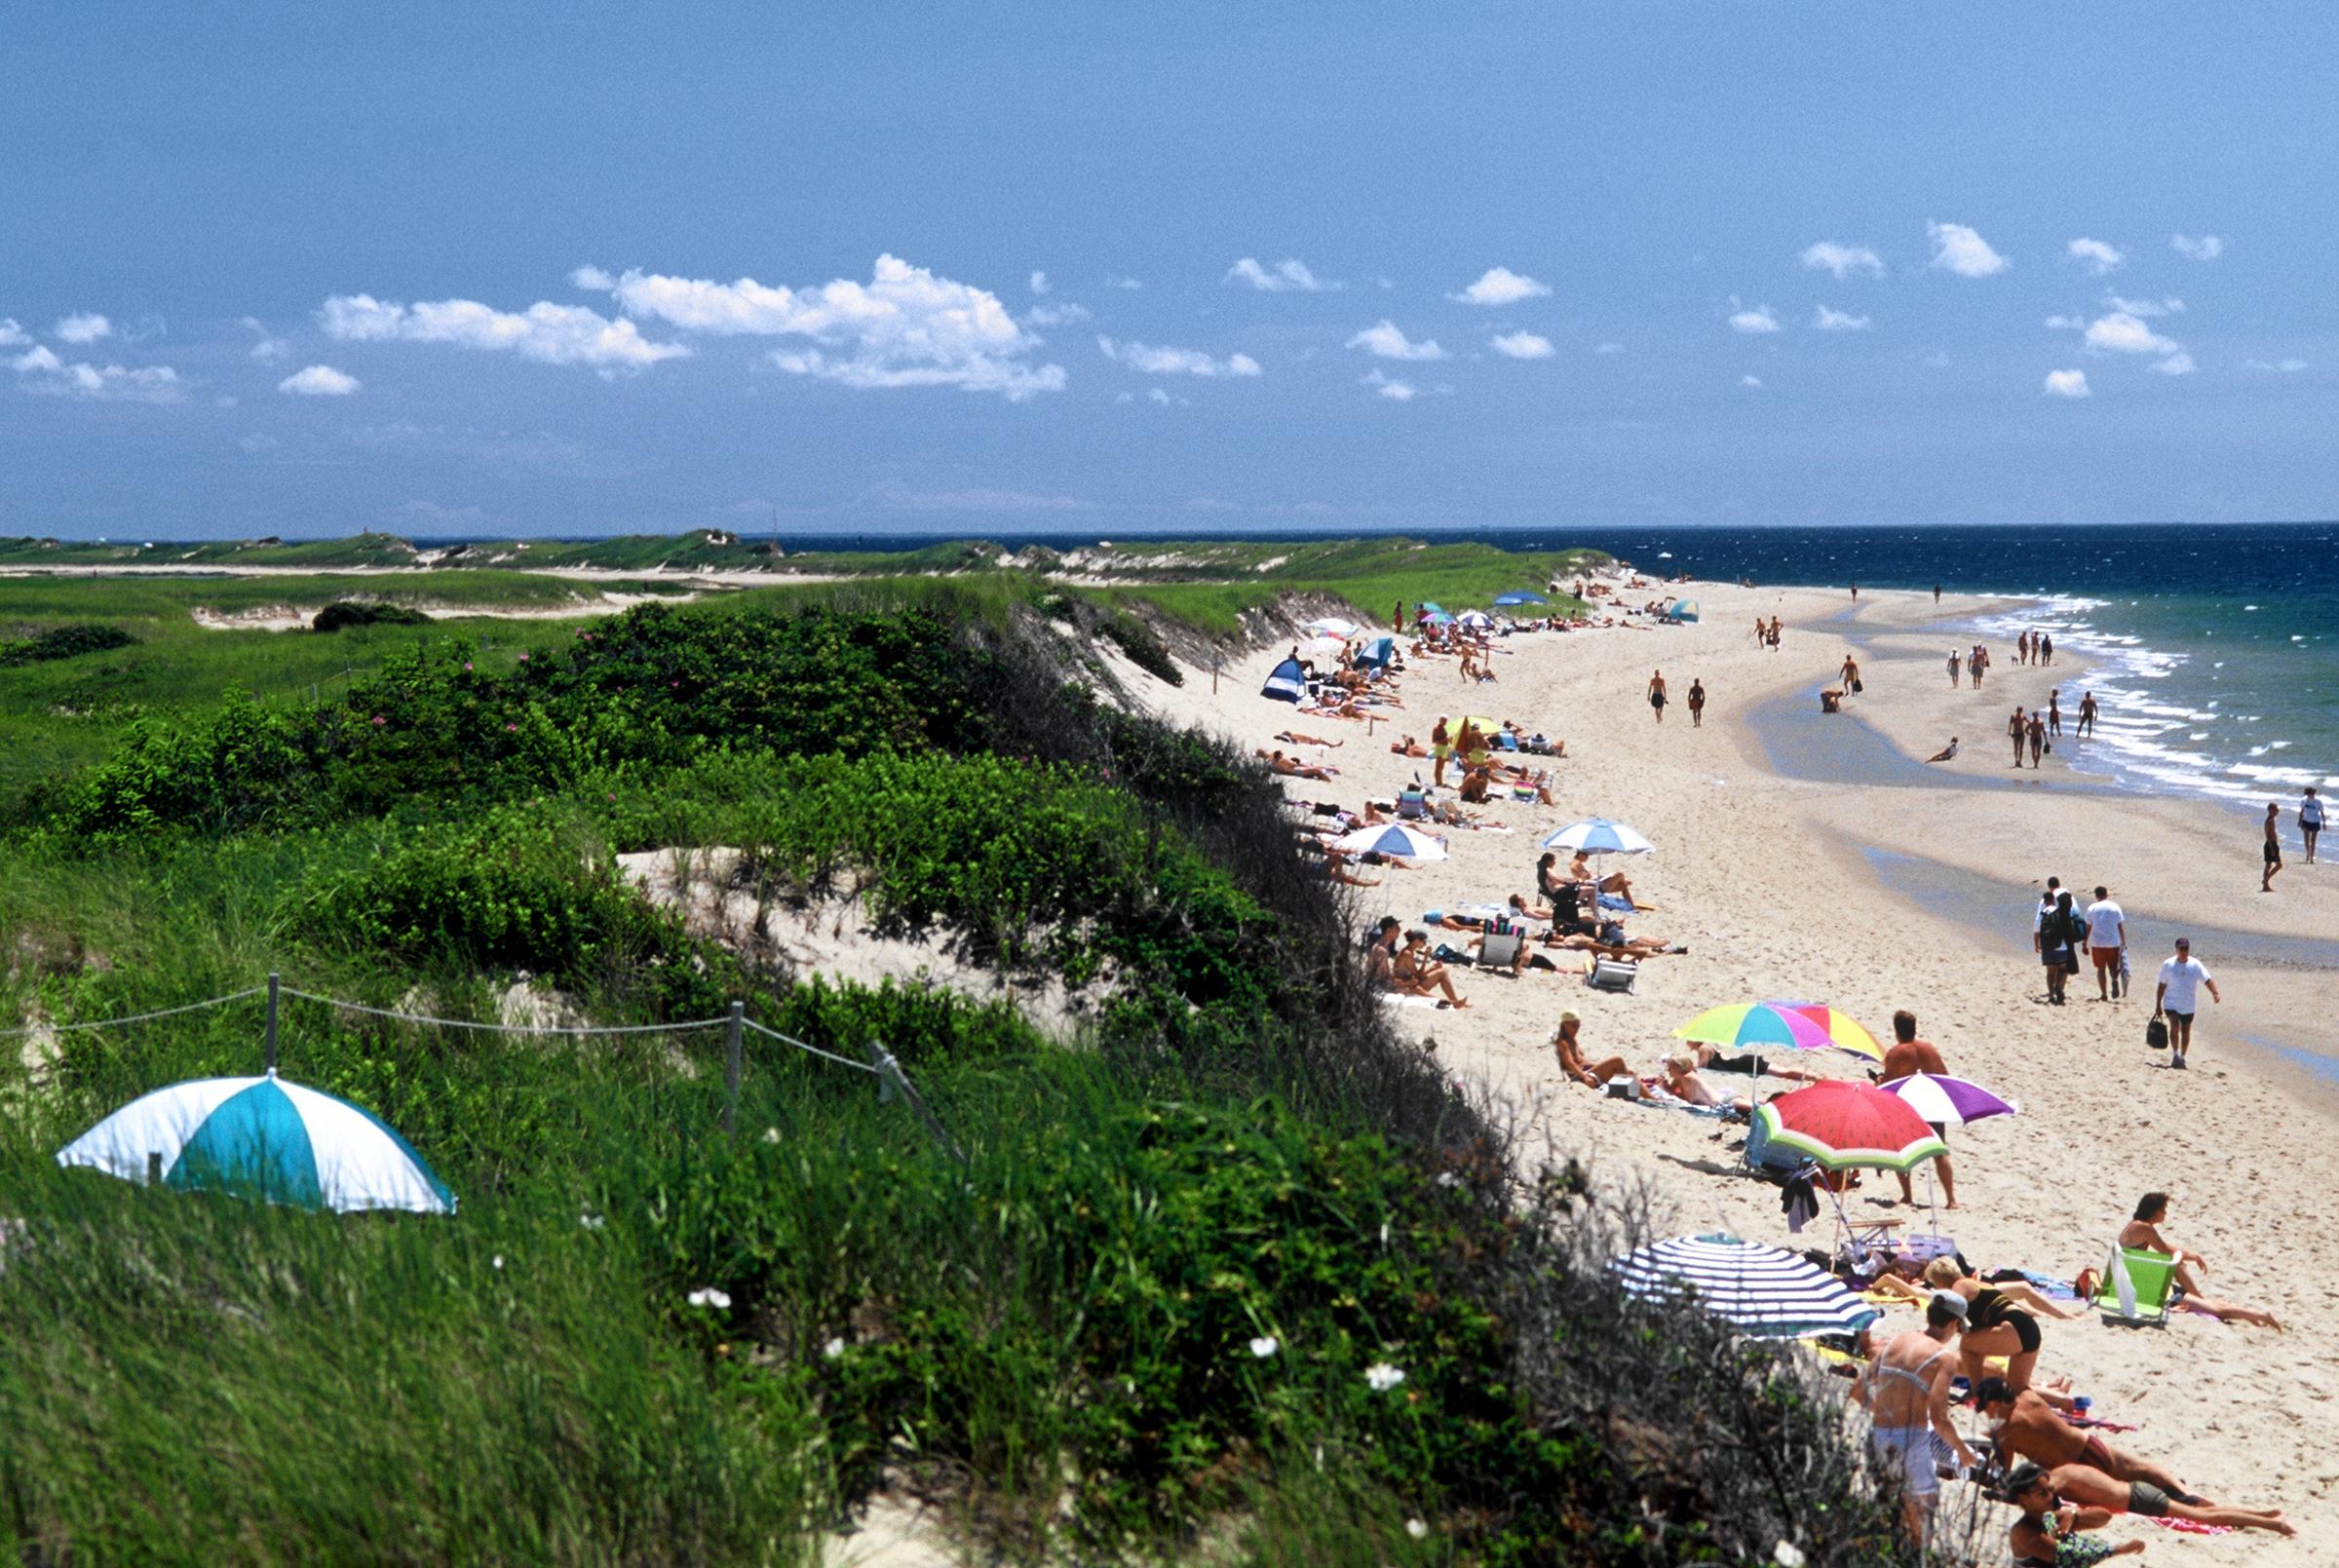 Gay beach provincetown